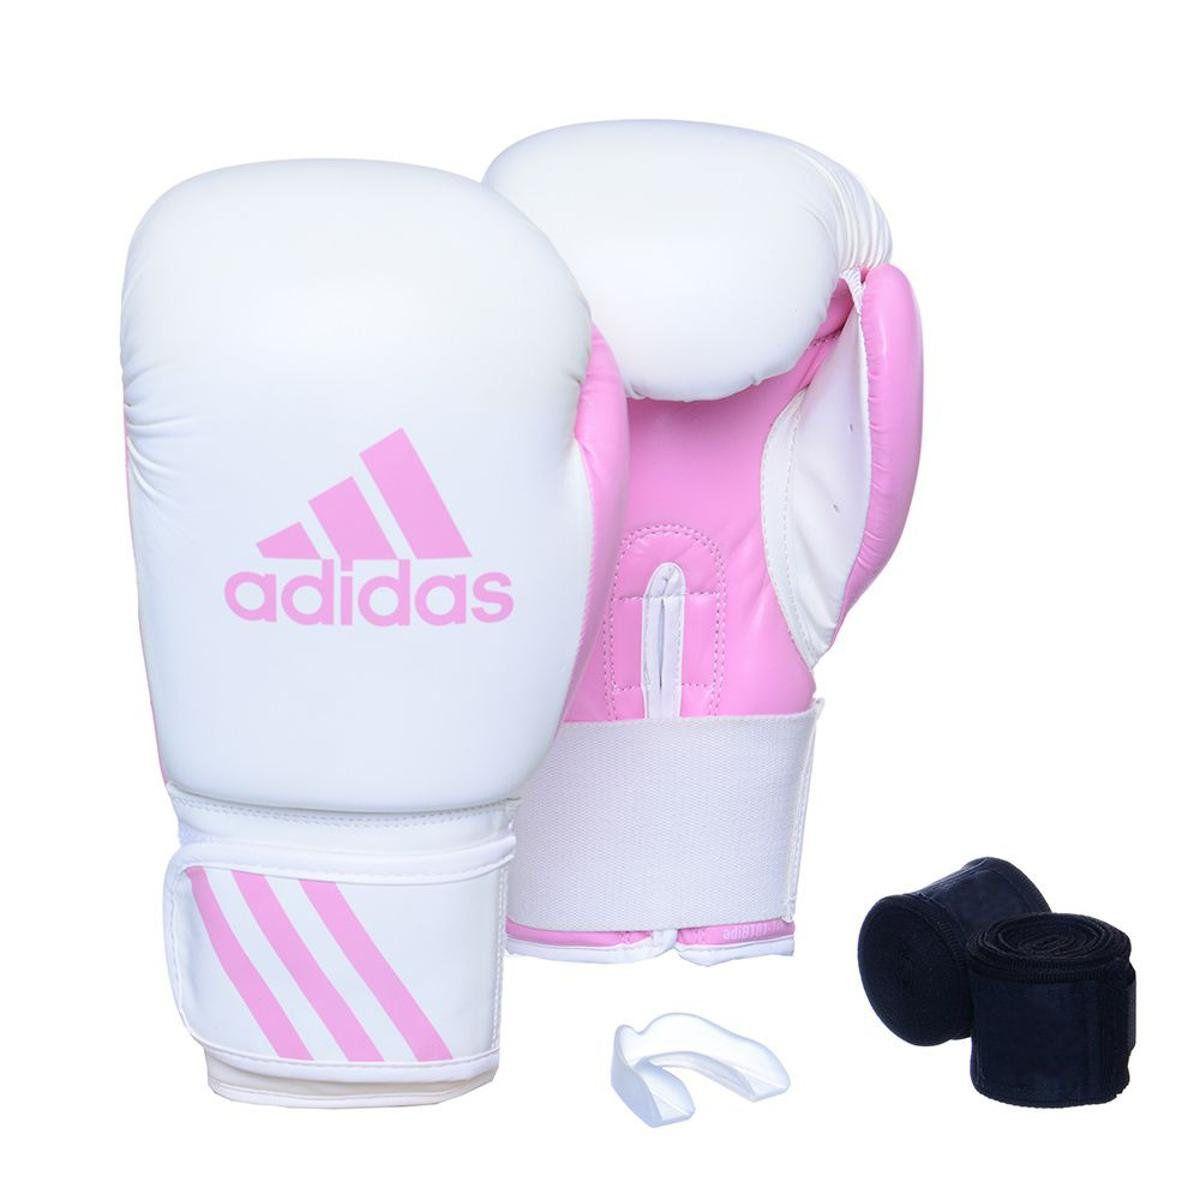 Kit Luvas Boxe / Muay Thai - Adidas Response - Branca / Rosa - 10/12/14 OZ